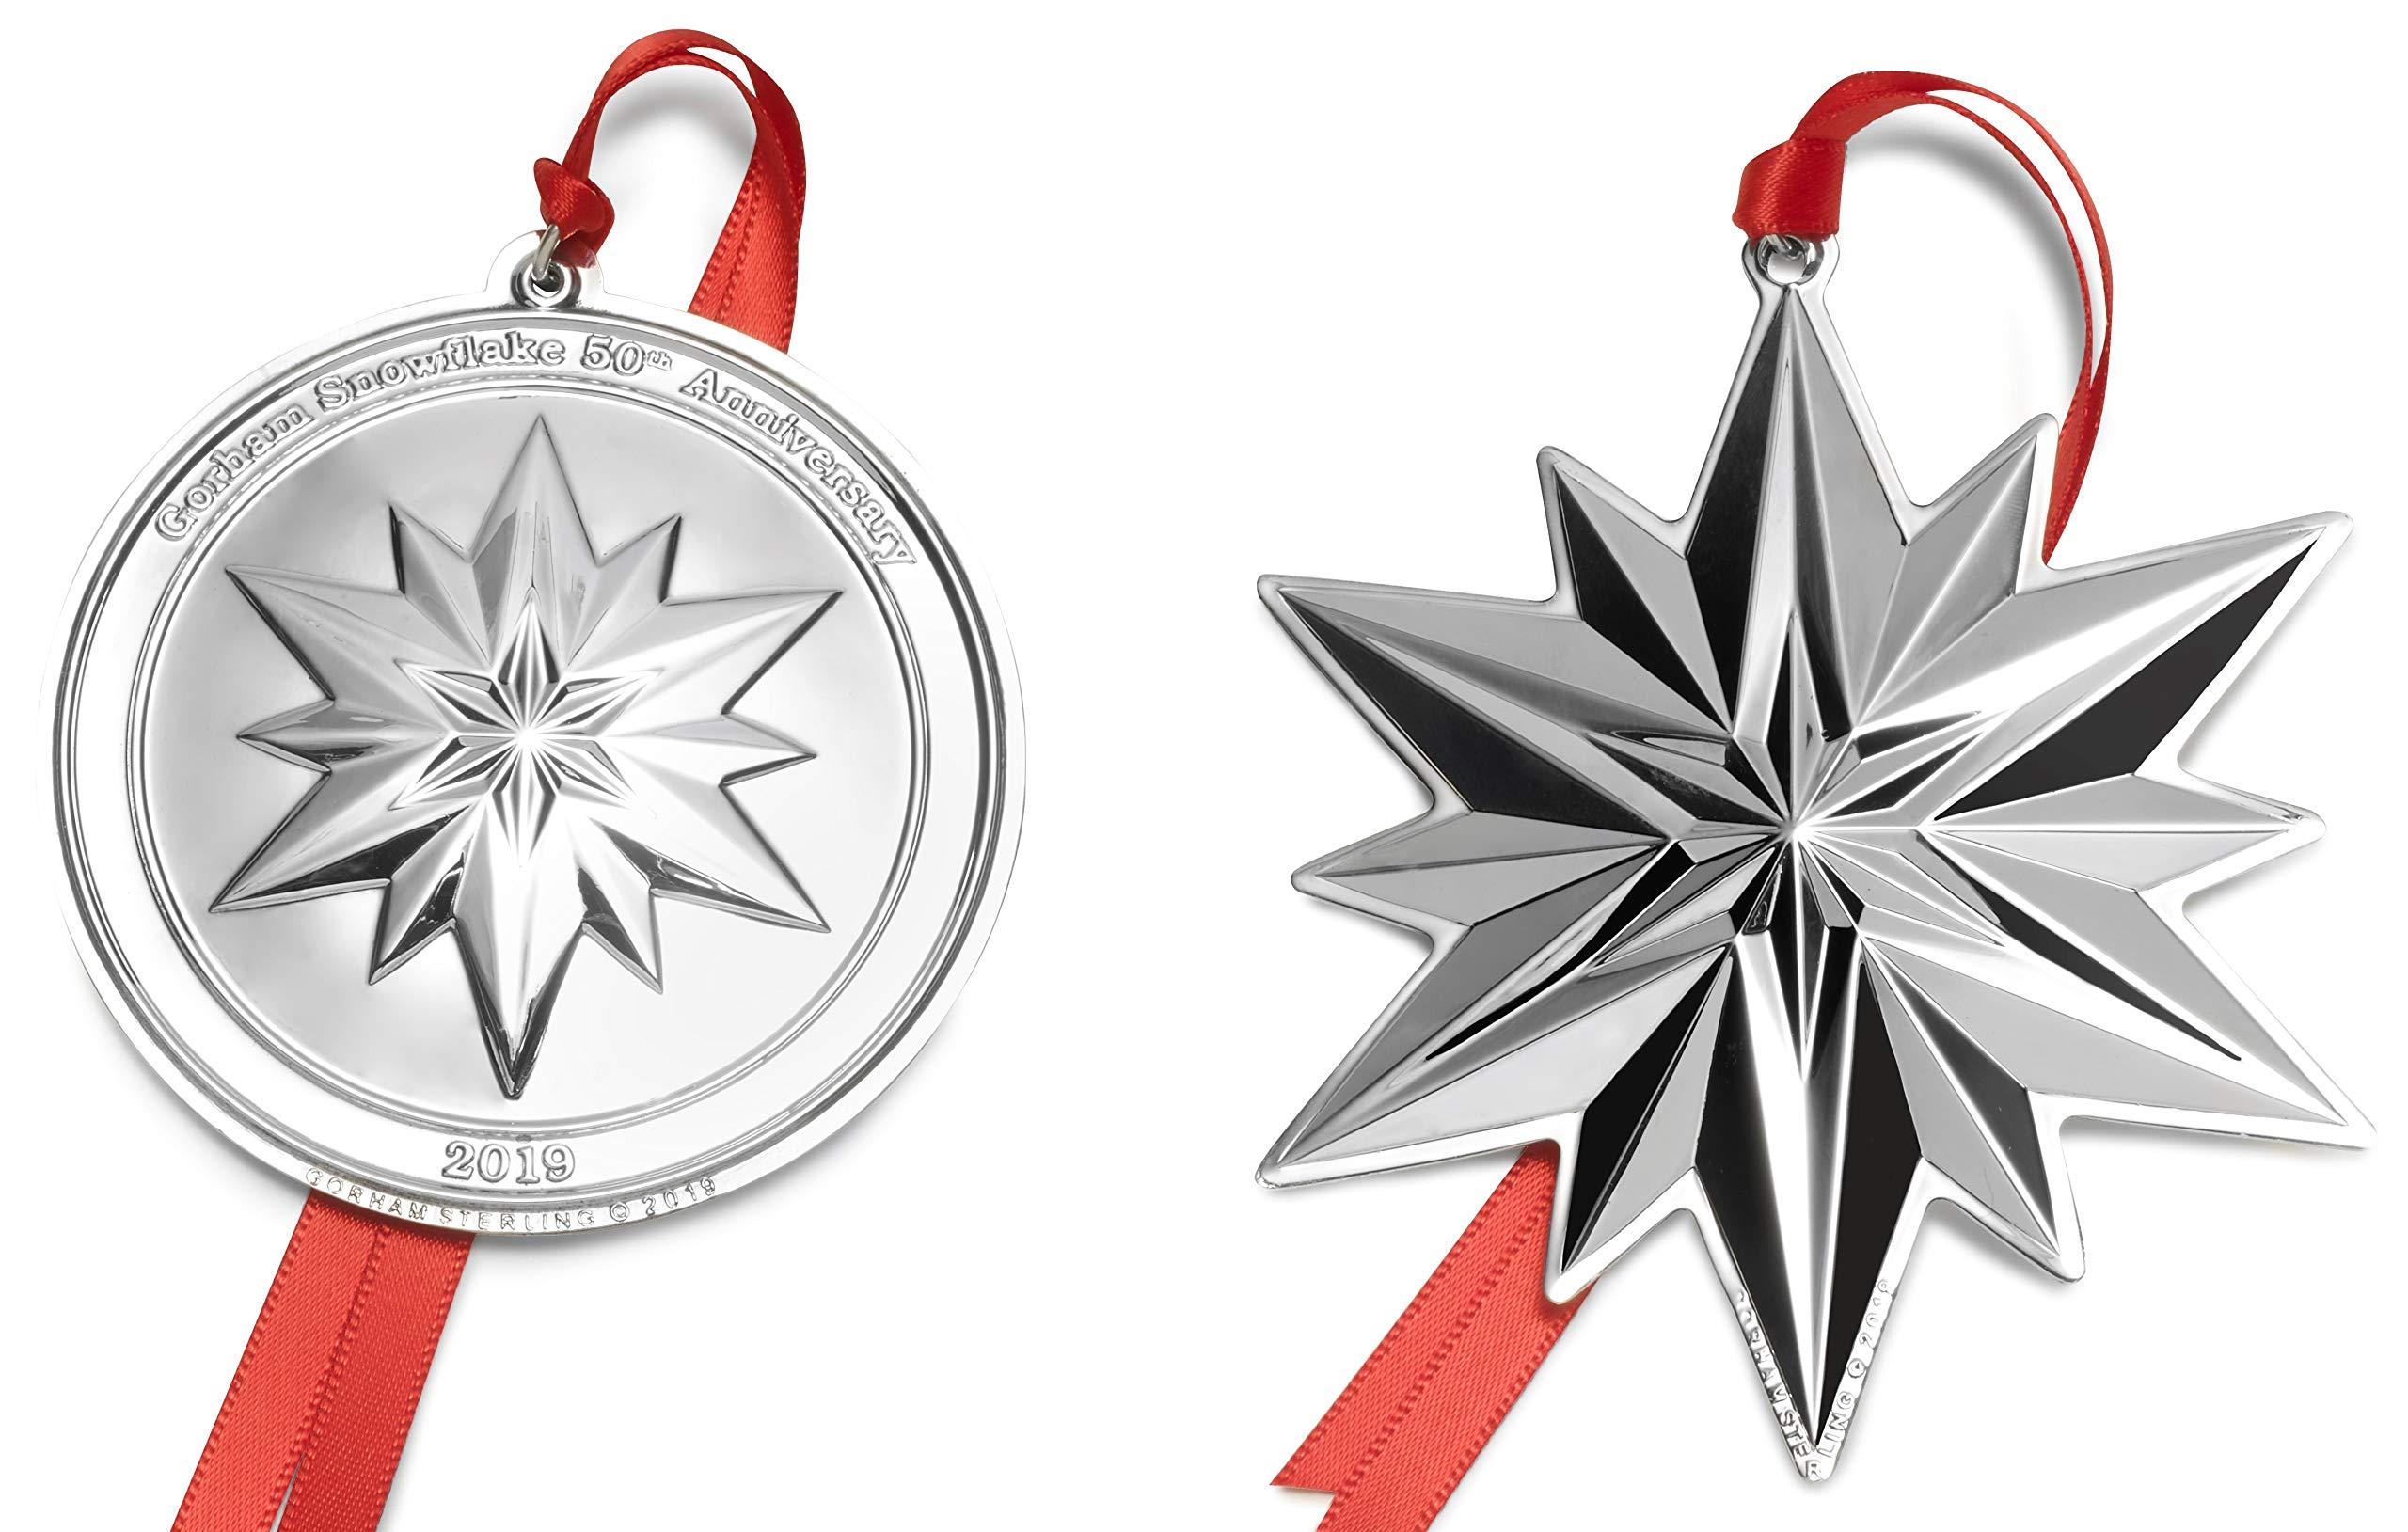 Gorham LB Set of 2 2019 Snowflake 50th Anniversary Ornament by Gorham (Image #1)